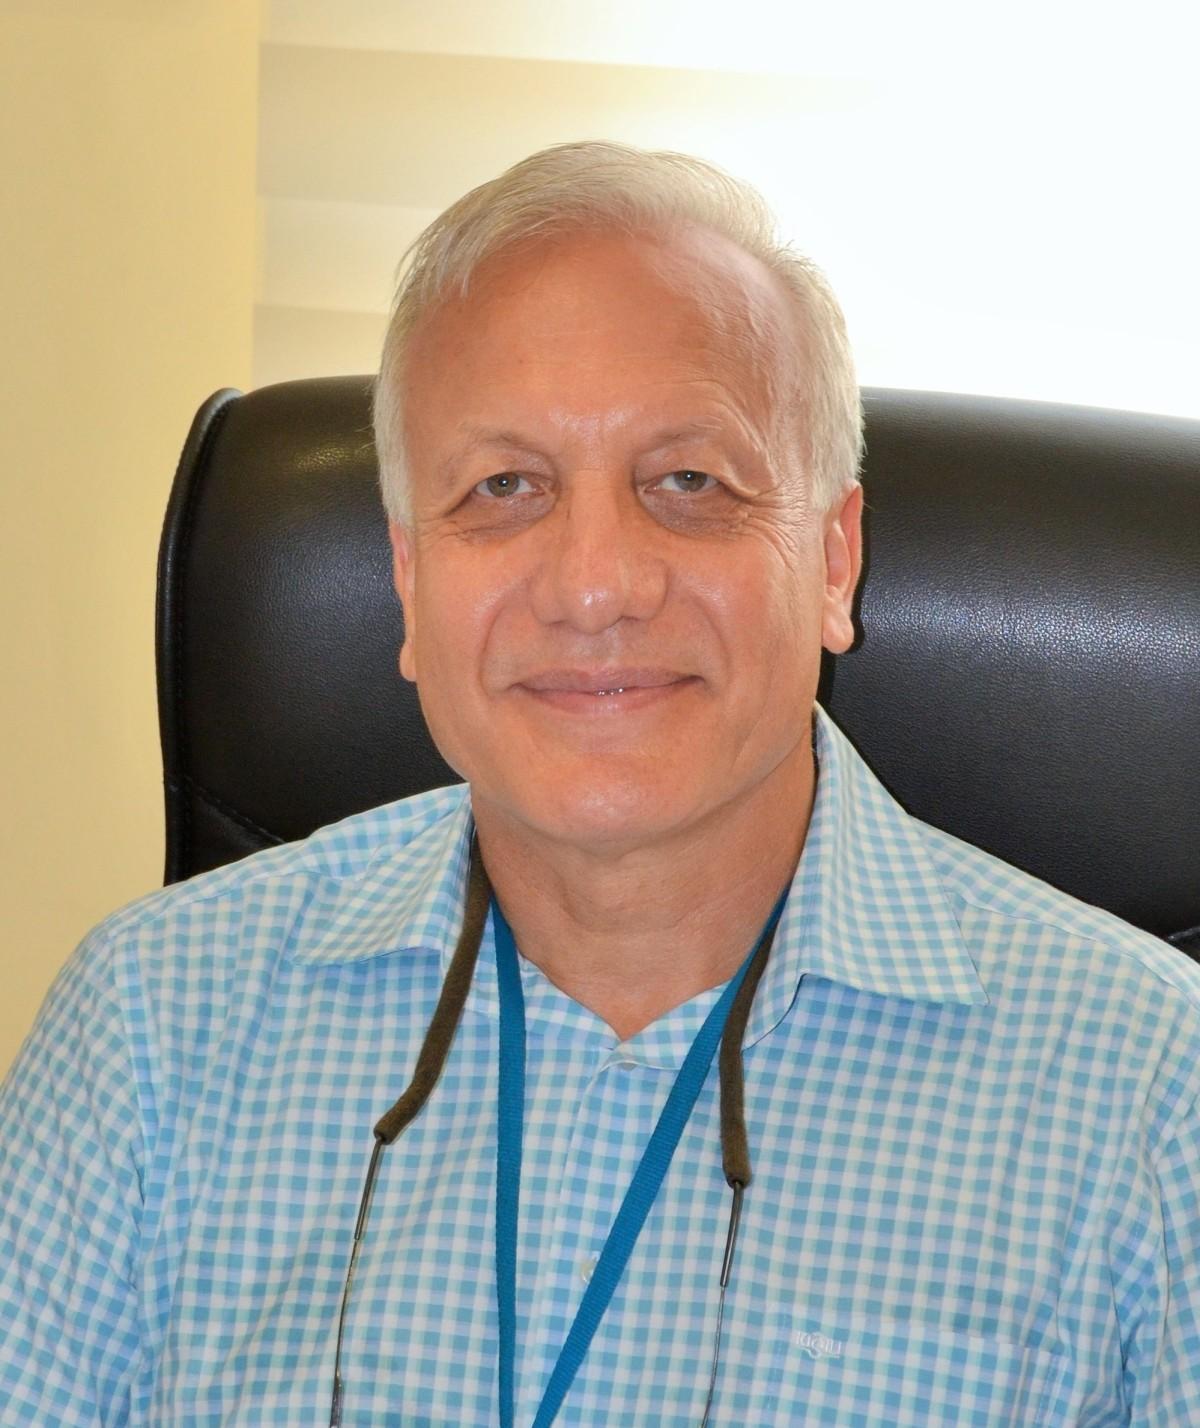 Dr. Mustafa Yüksel, Pektus, chest wall repair and the Yükselbar